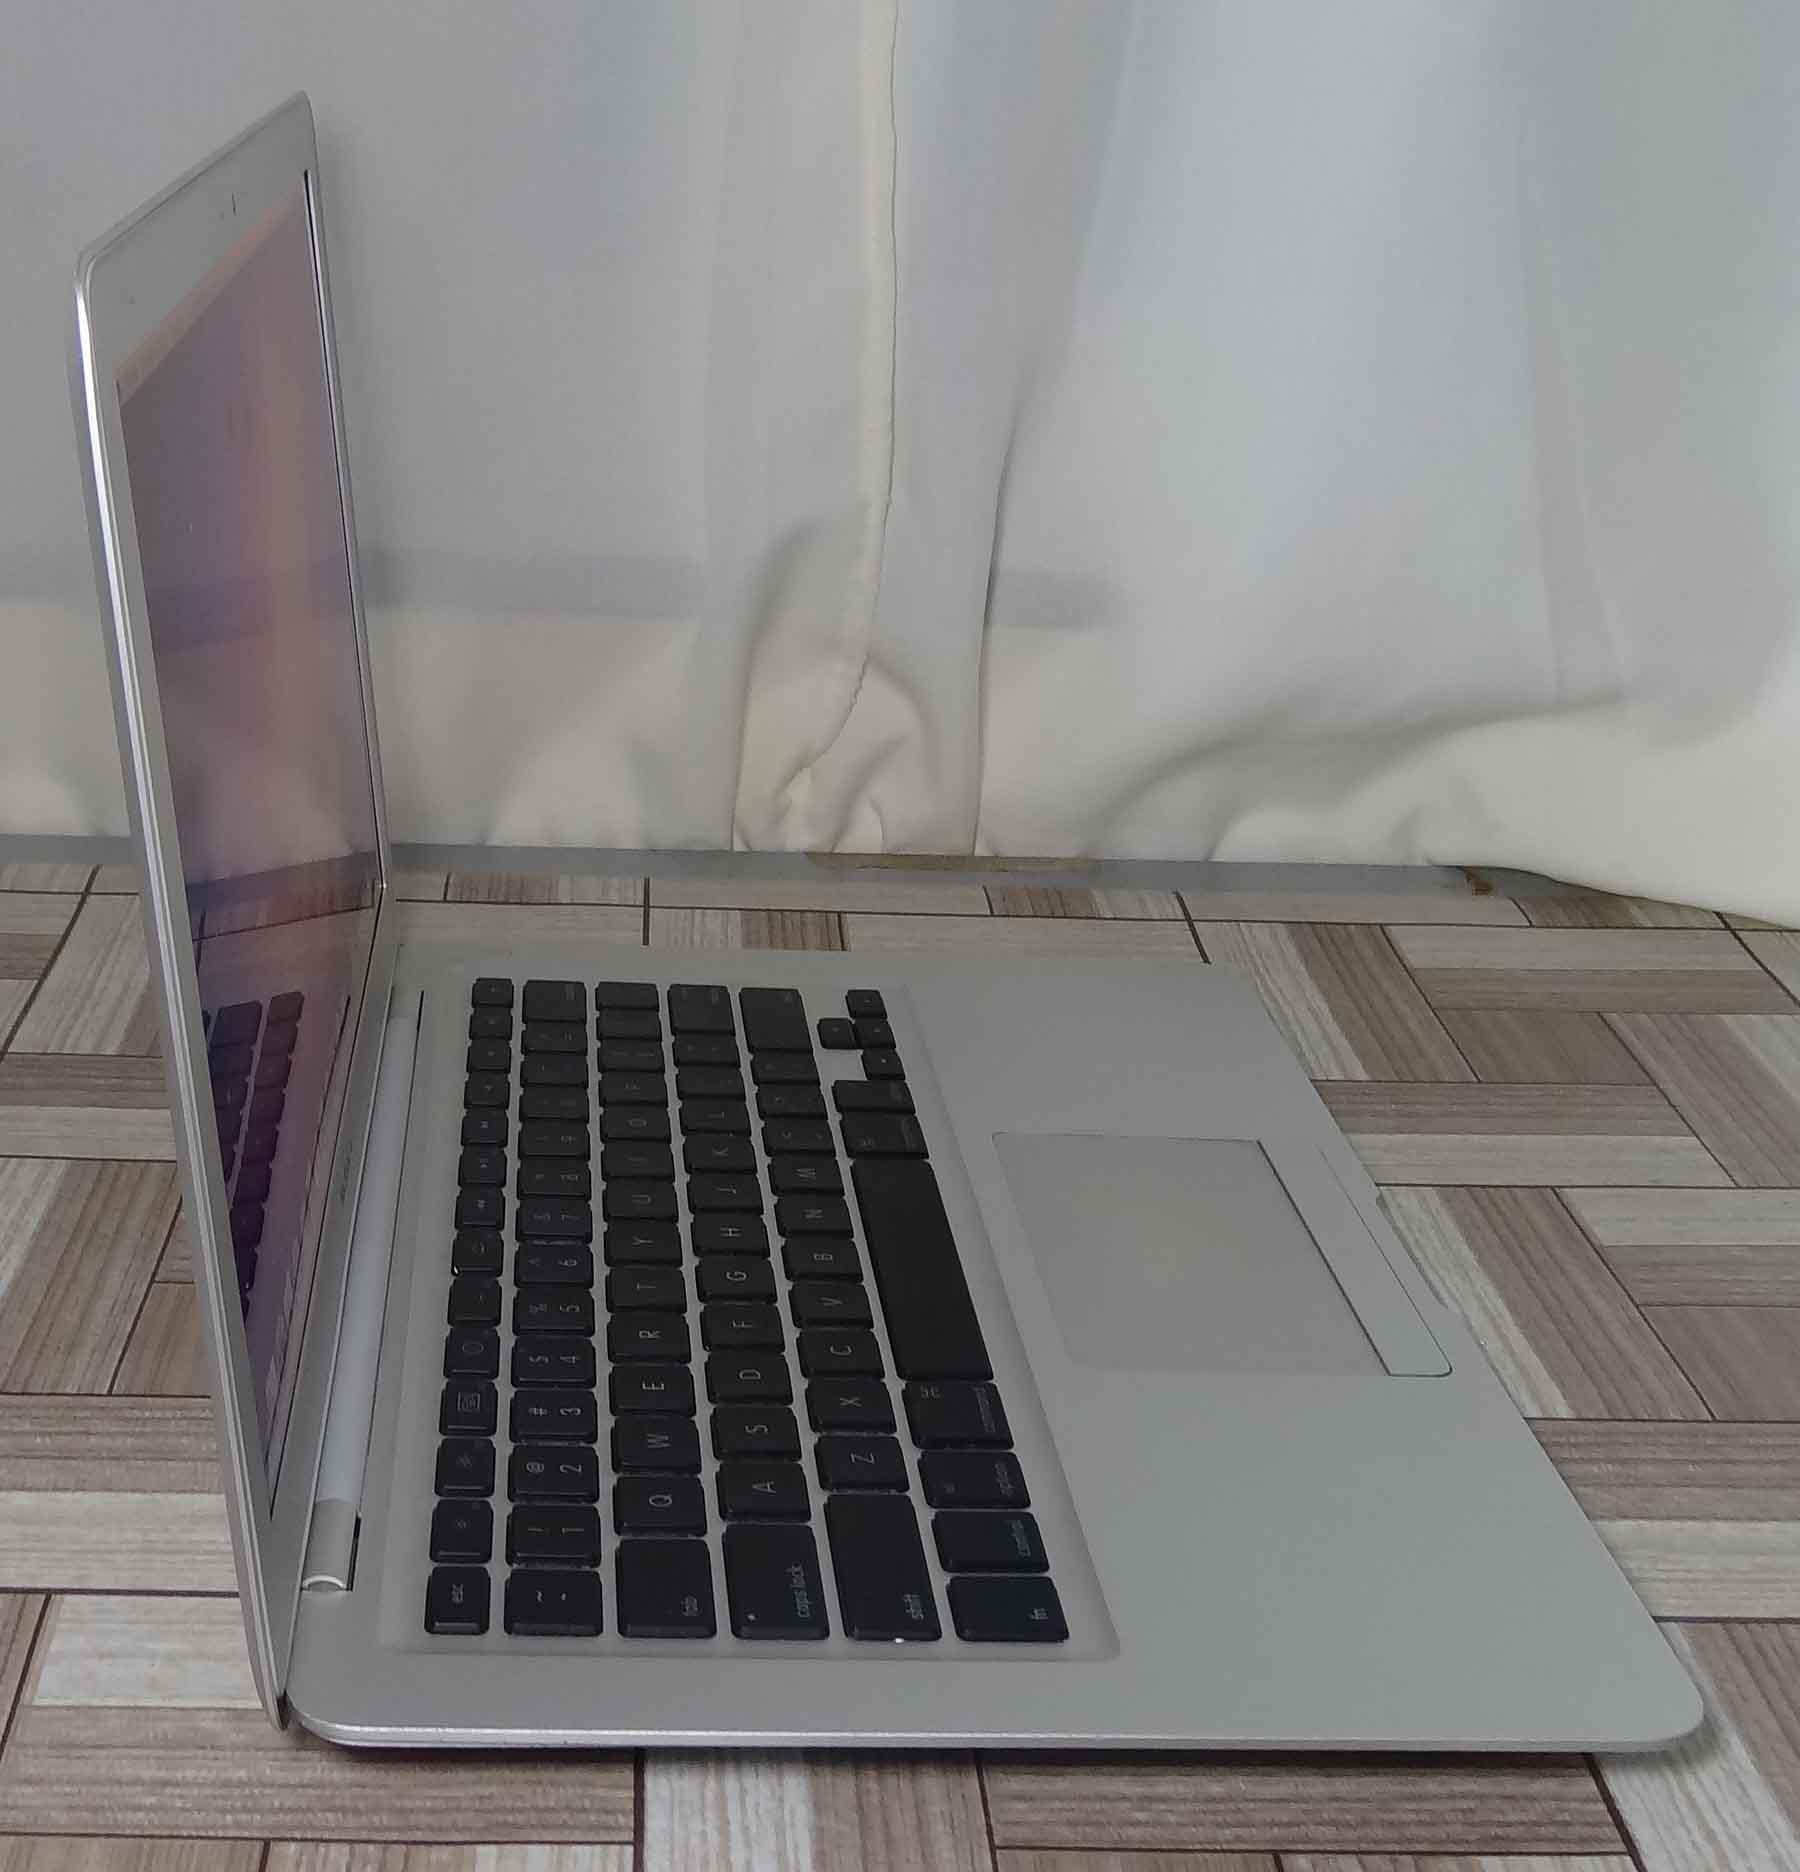 Macbook Air MB003LL/A 13.3'' Core 2 Duo 1.6GHz 2GB HD-80GB